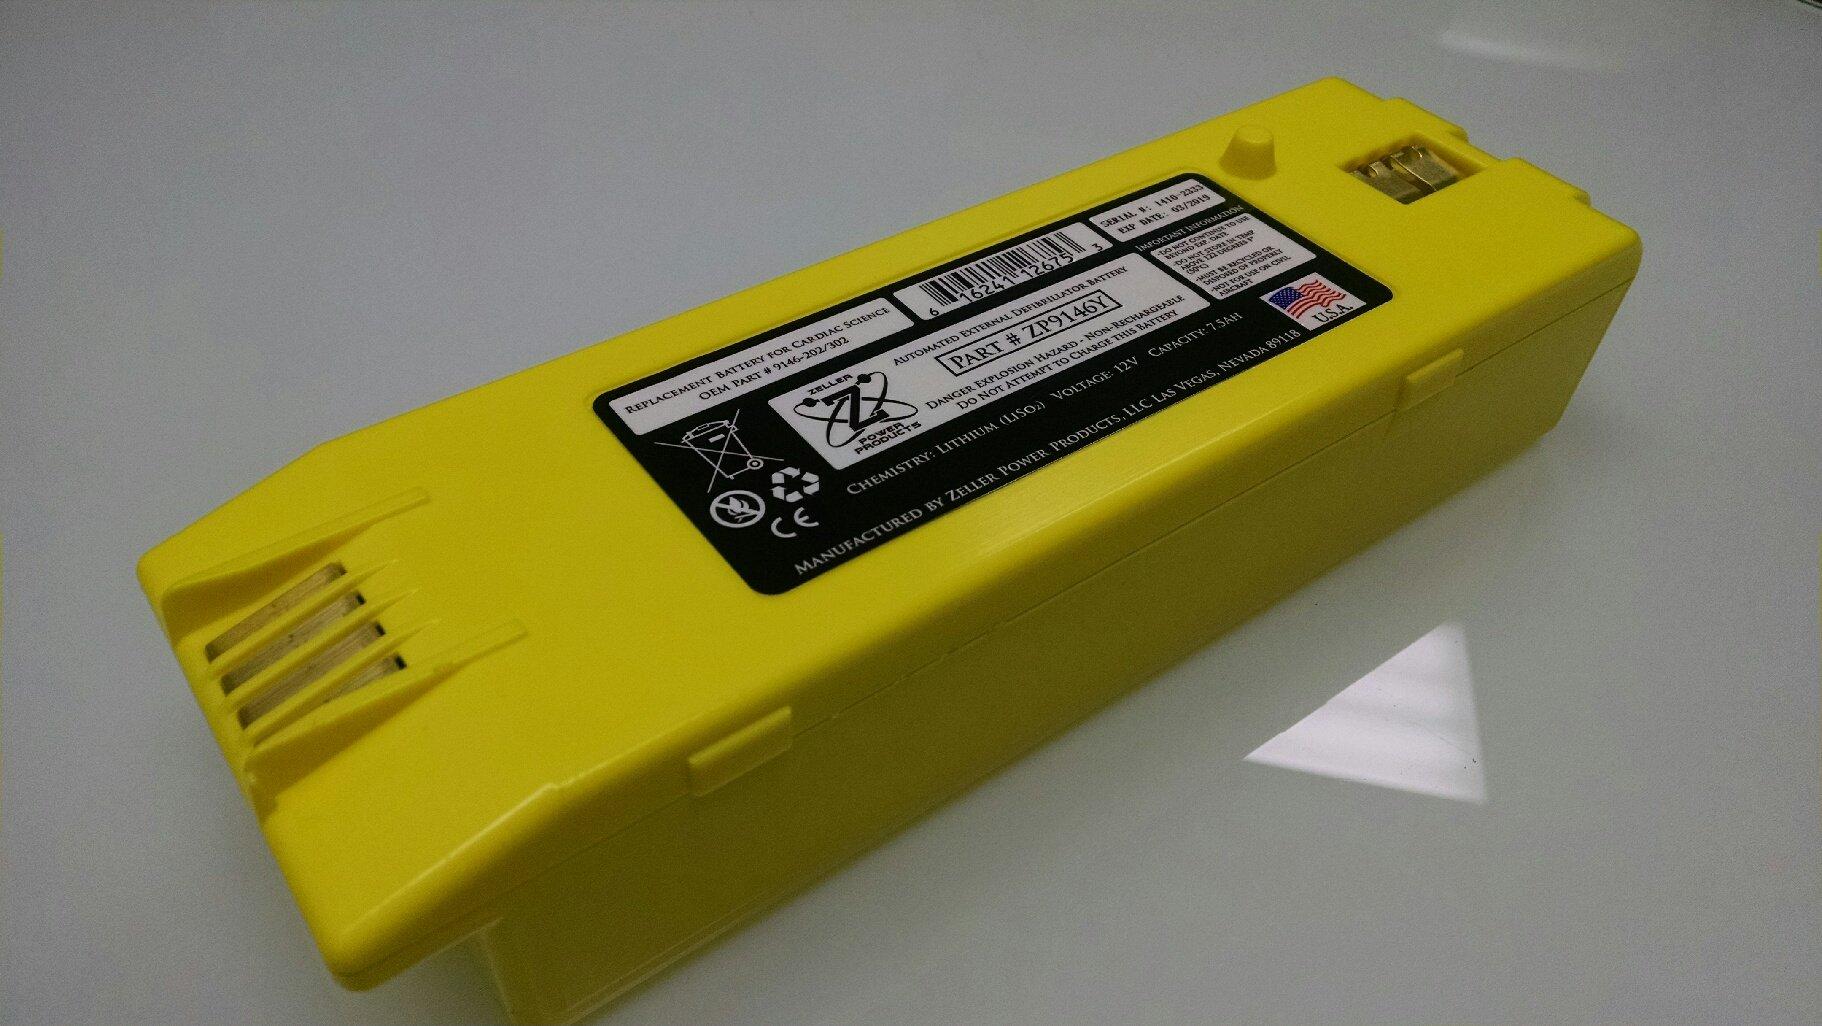 9146-302 Battery for Cardiac Science Powerheart G3 AED